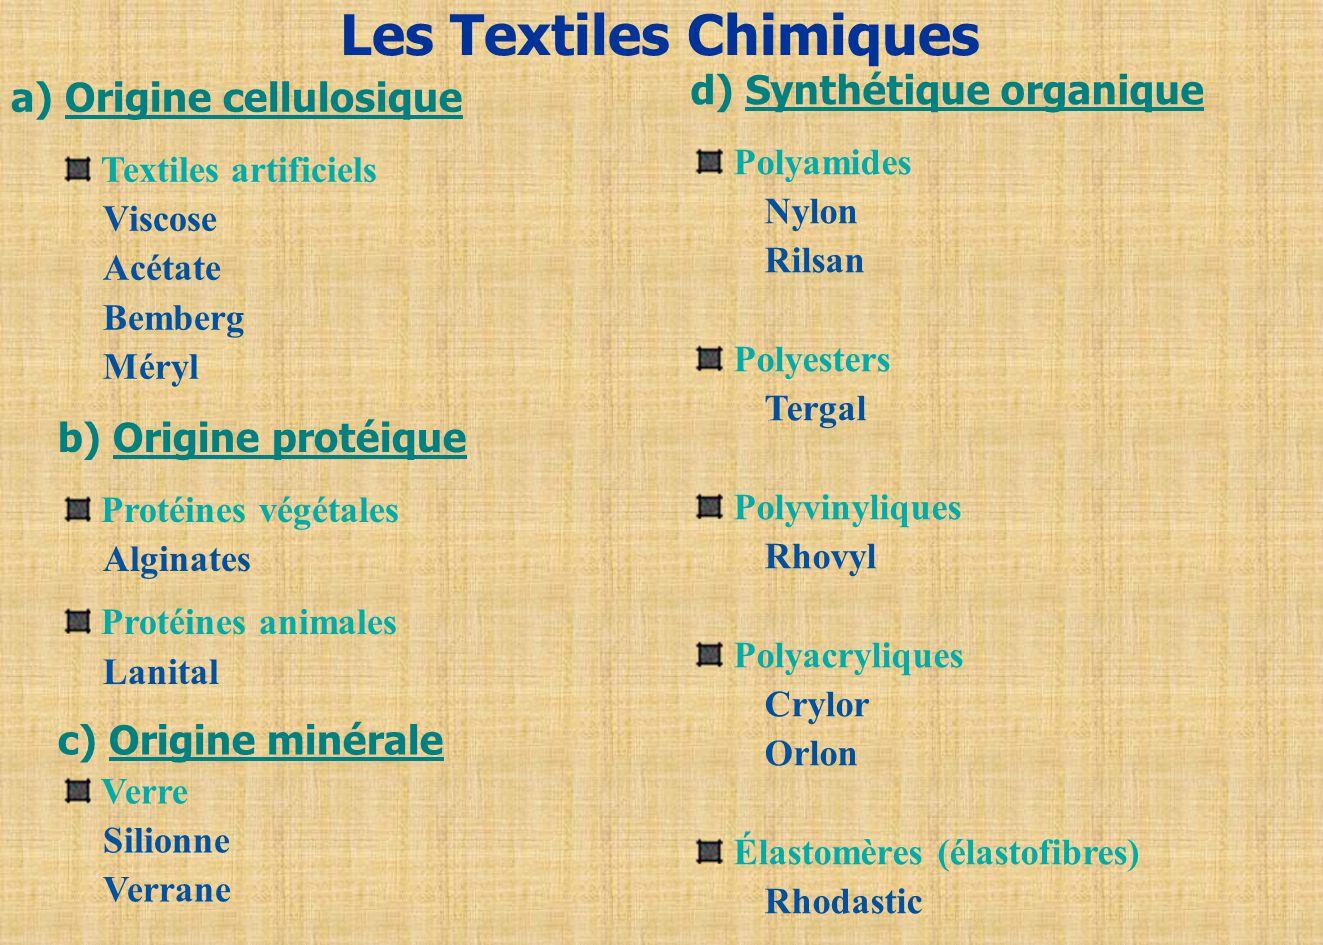 d) Synthétique organique Polyamides Nylon Rilsan Polyesters Tergal Polyvinyliques Rhovyl Polyacryliques Crylor Orlon Élastomères (élastofibres) Rhodas